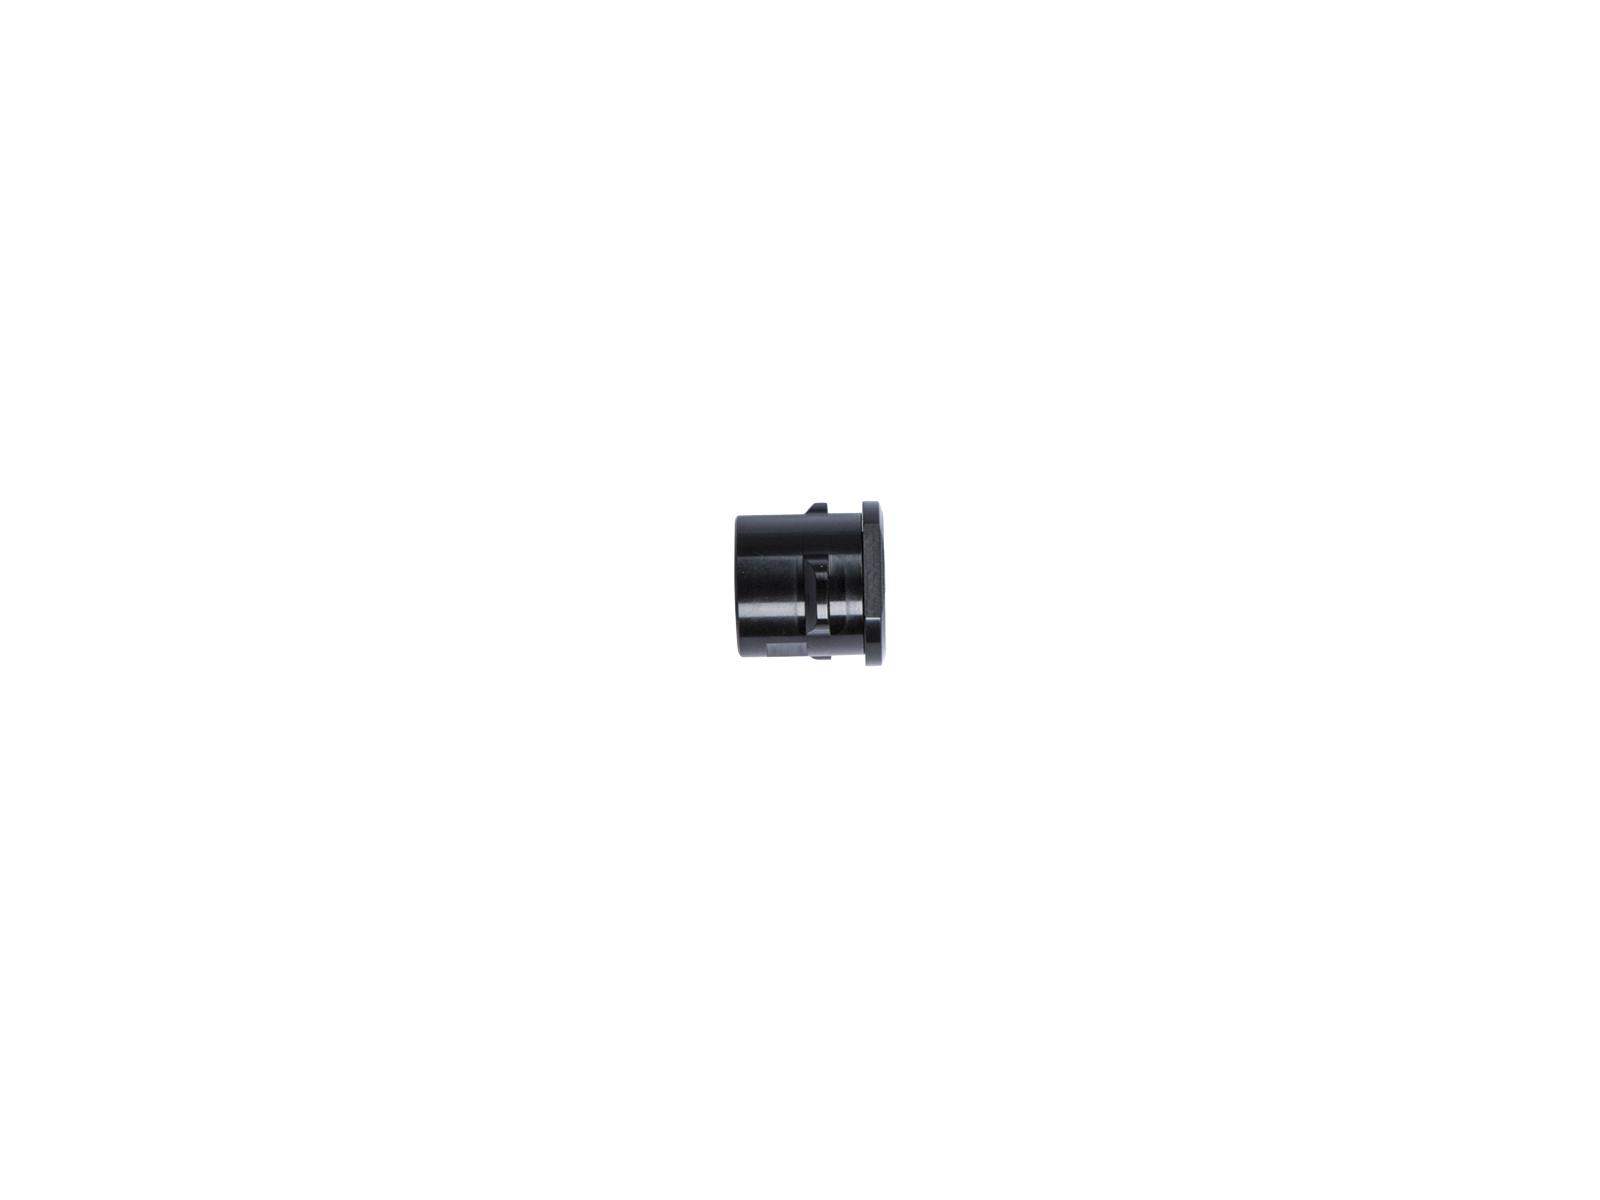 B&T QD Adaptor for MP9 product image